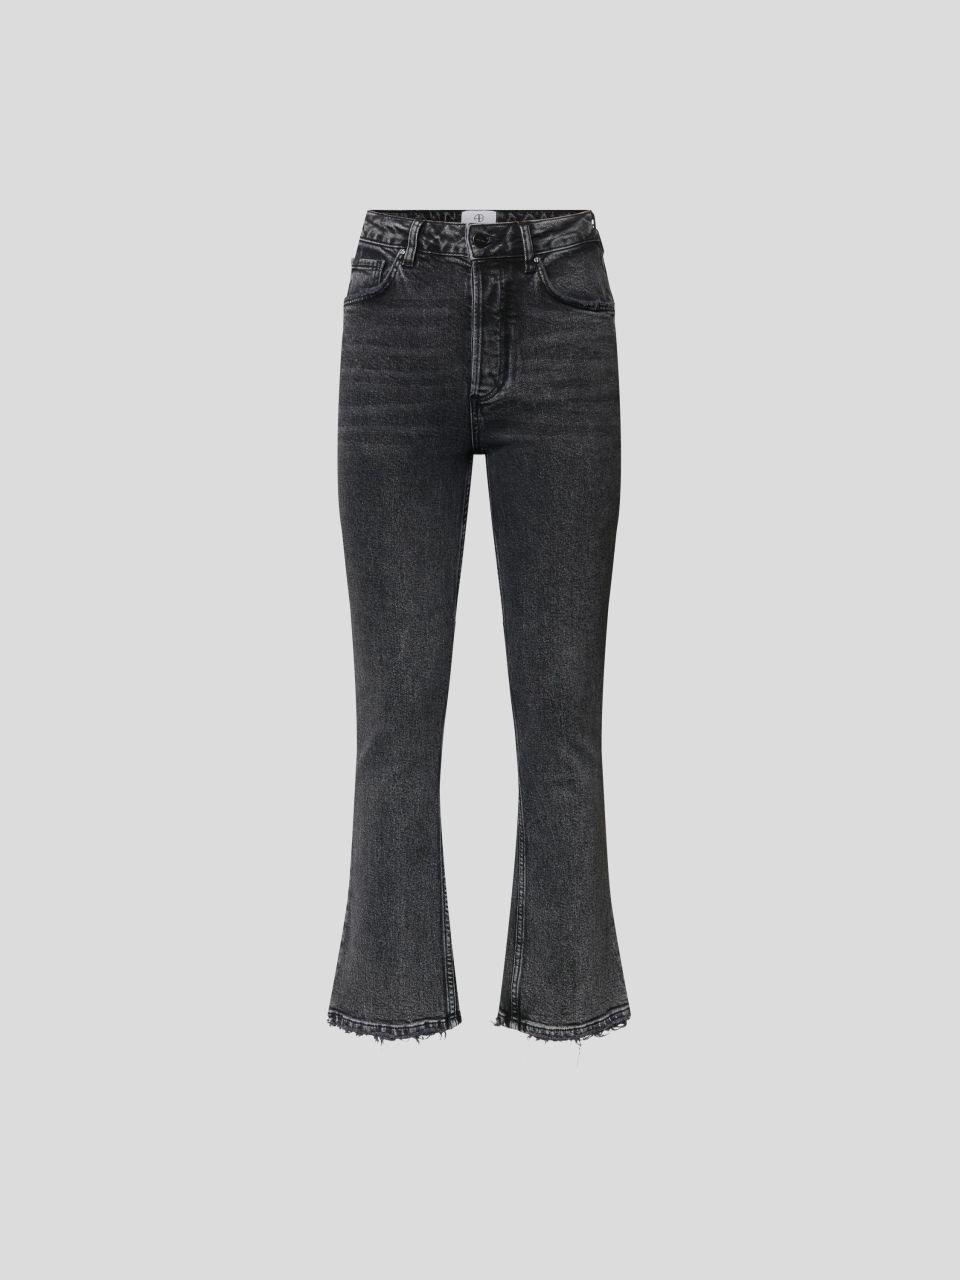 High Rise Jeans im Flared Cut